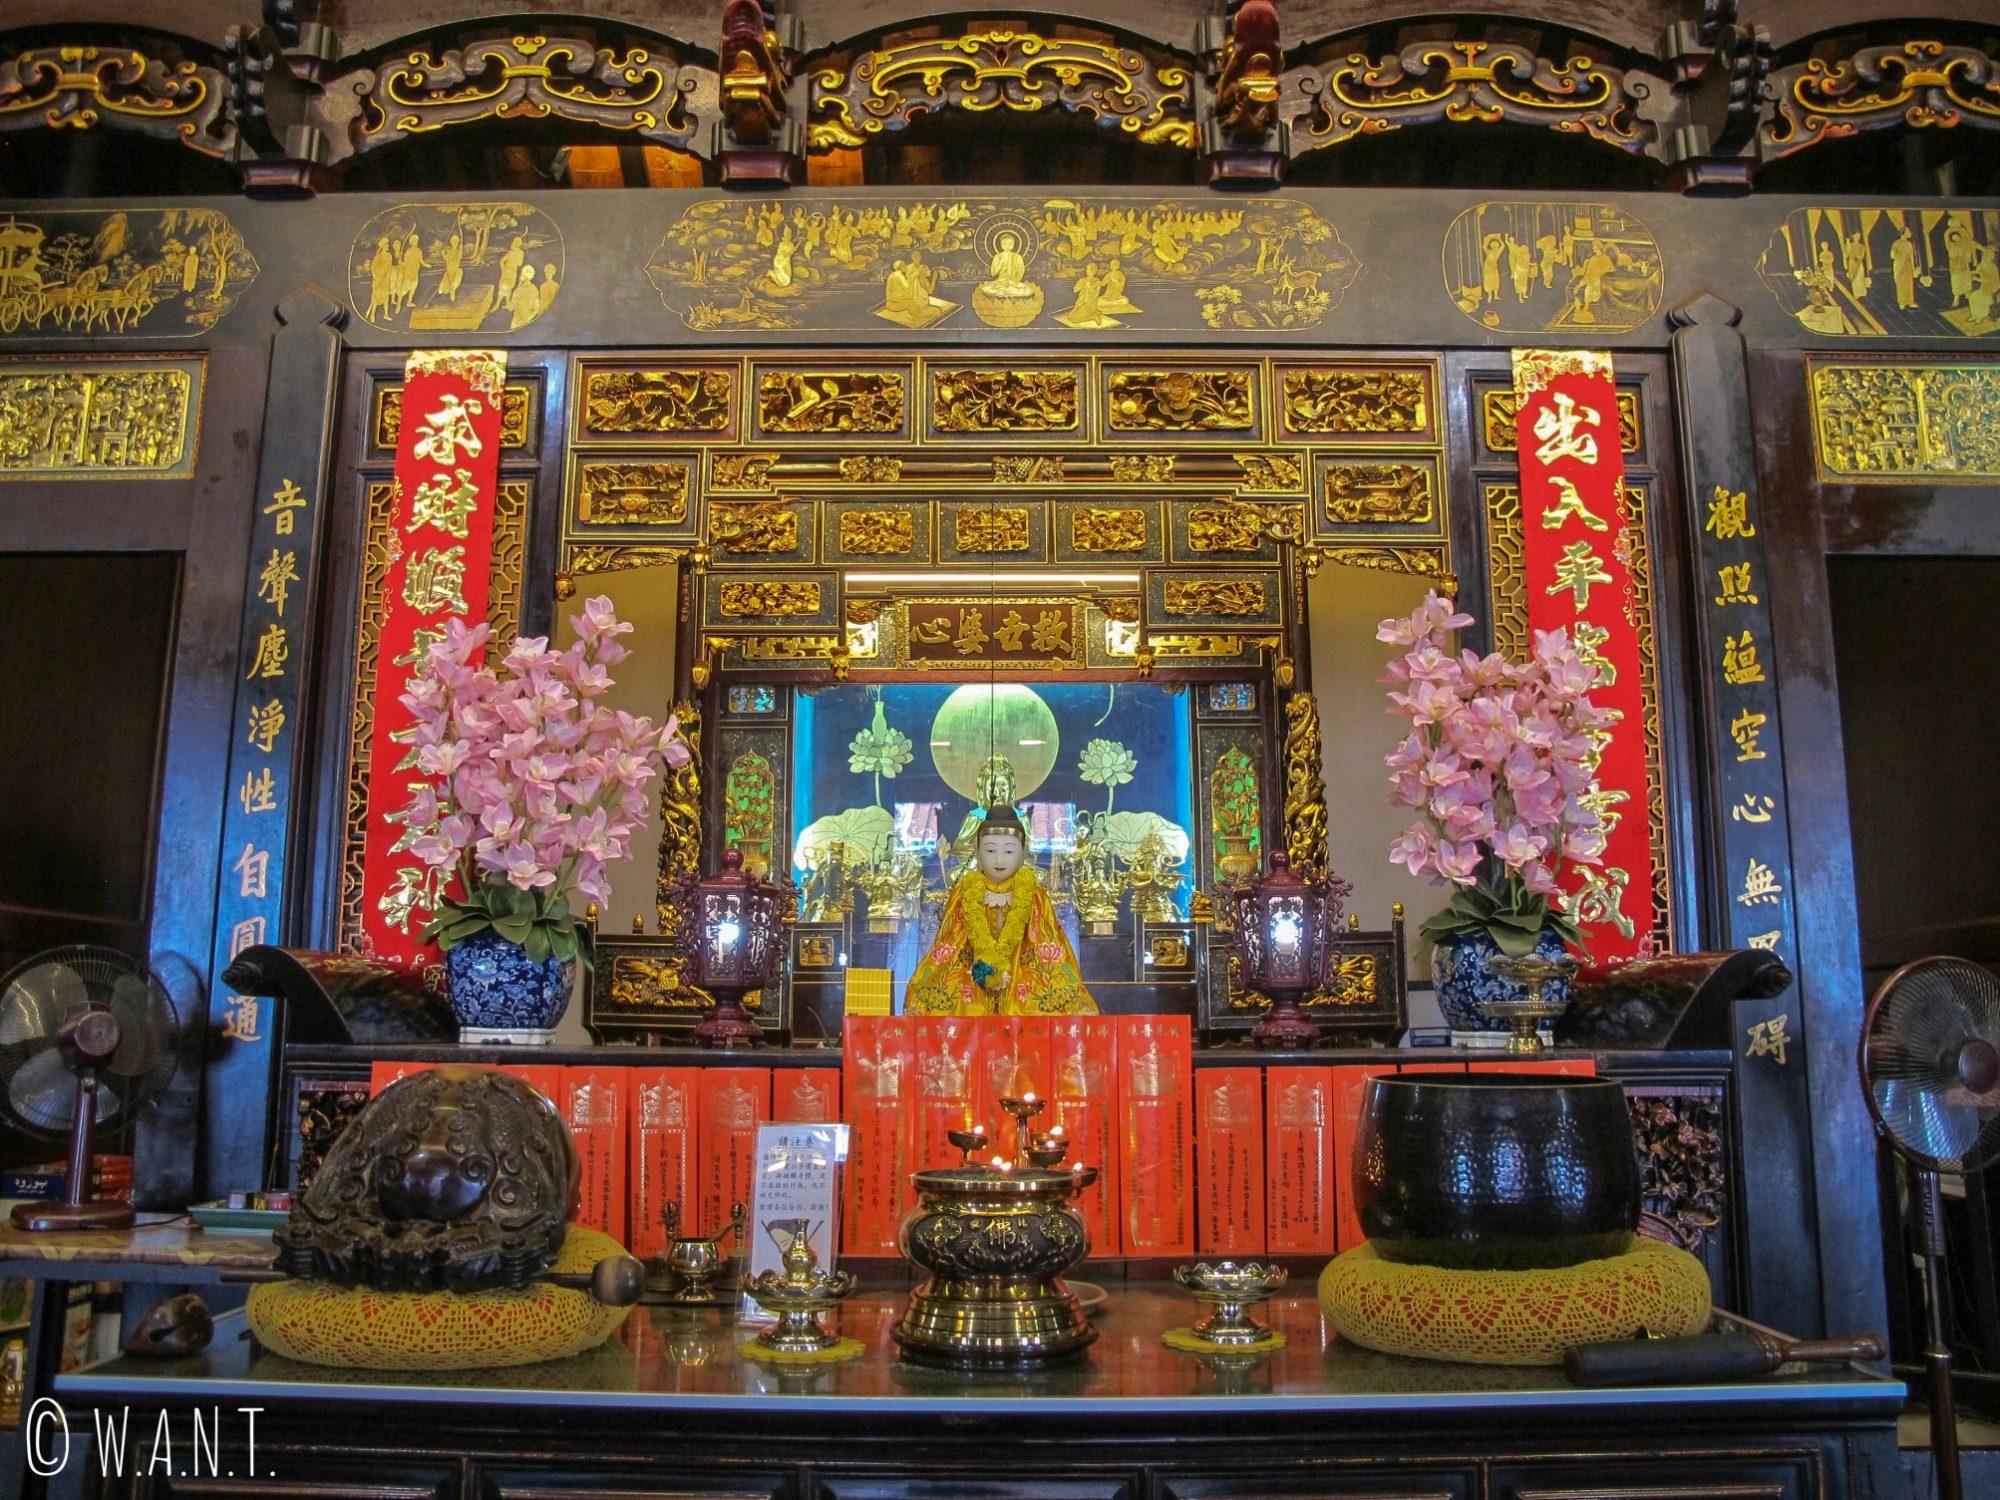 Autel du temple chinois Cheng Hoon Teng de Malacca